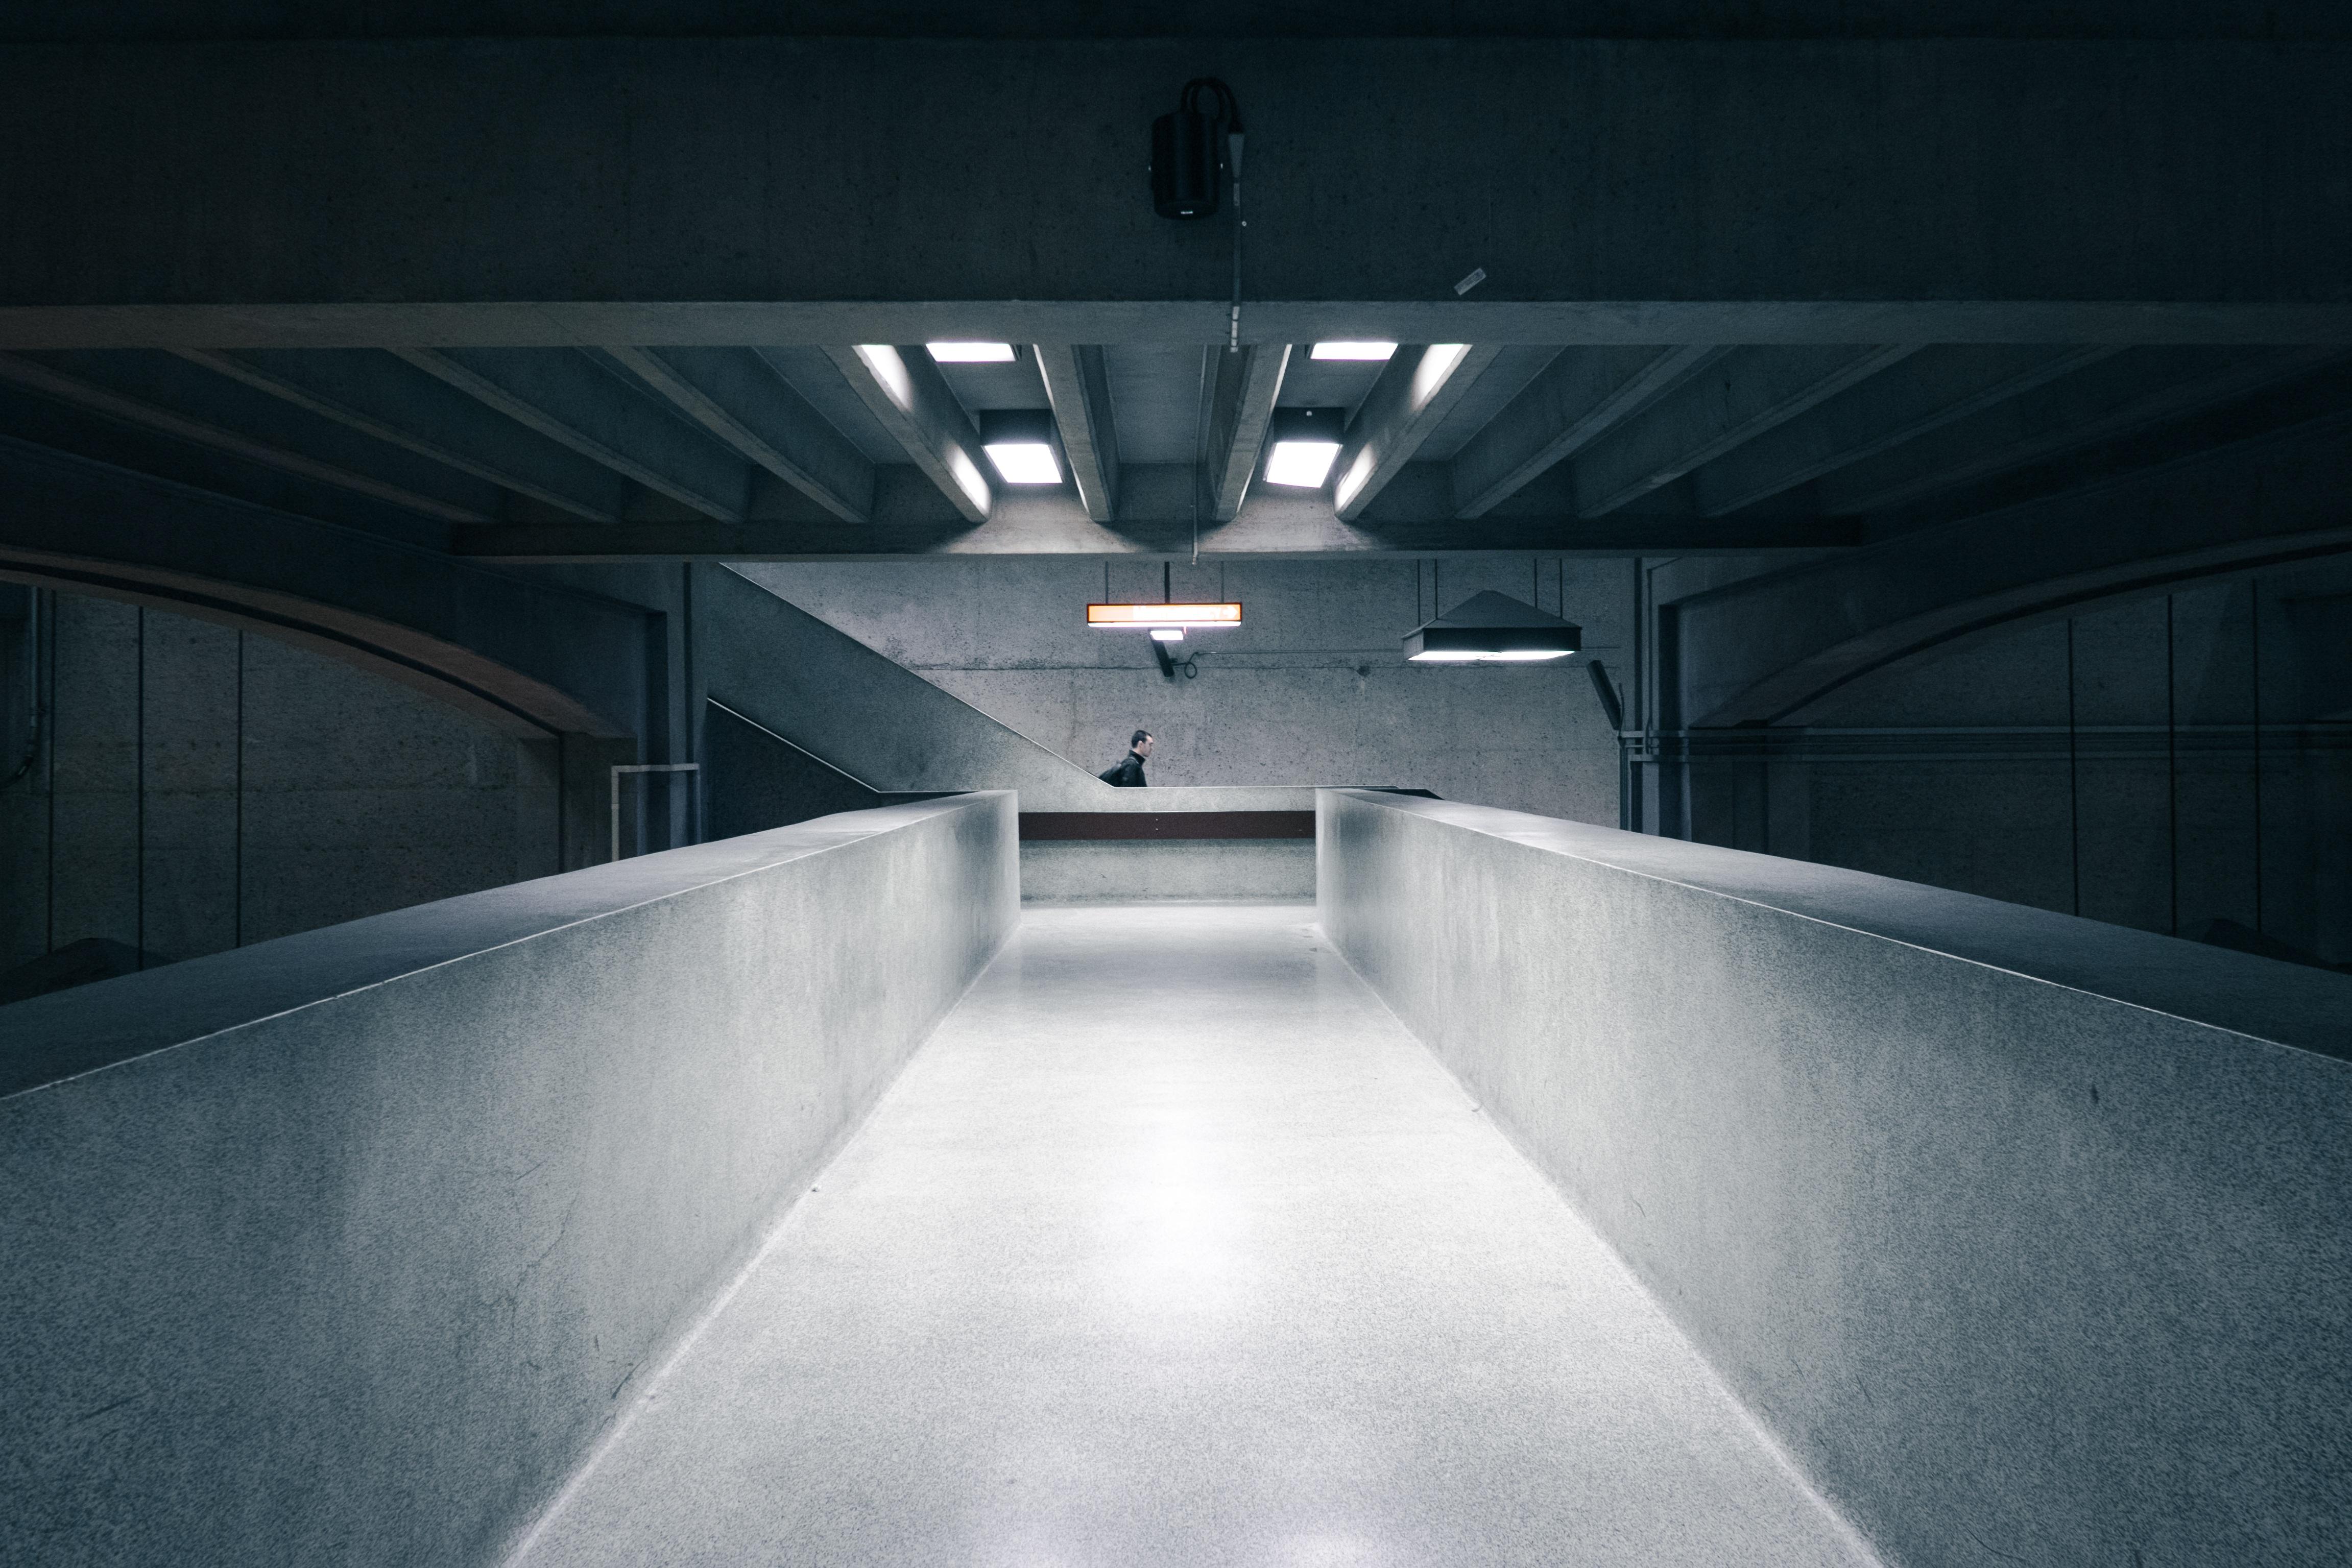 dark basement stairs. Person Light Structure White Bridge Perspective Building Urban Wall Staircase Tunnel Escalator Subway Underground Transportation Construction Dark Basement Stairs